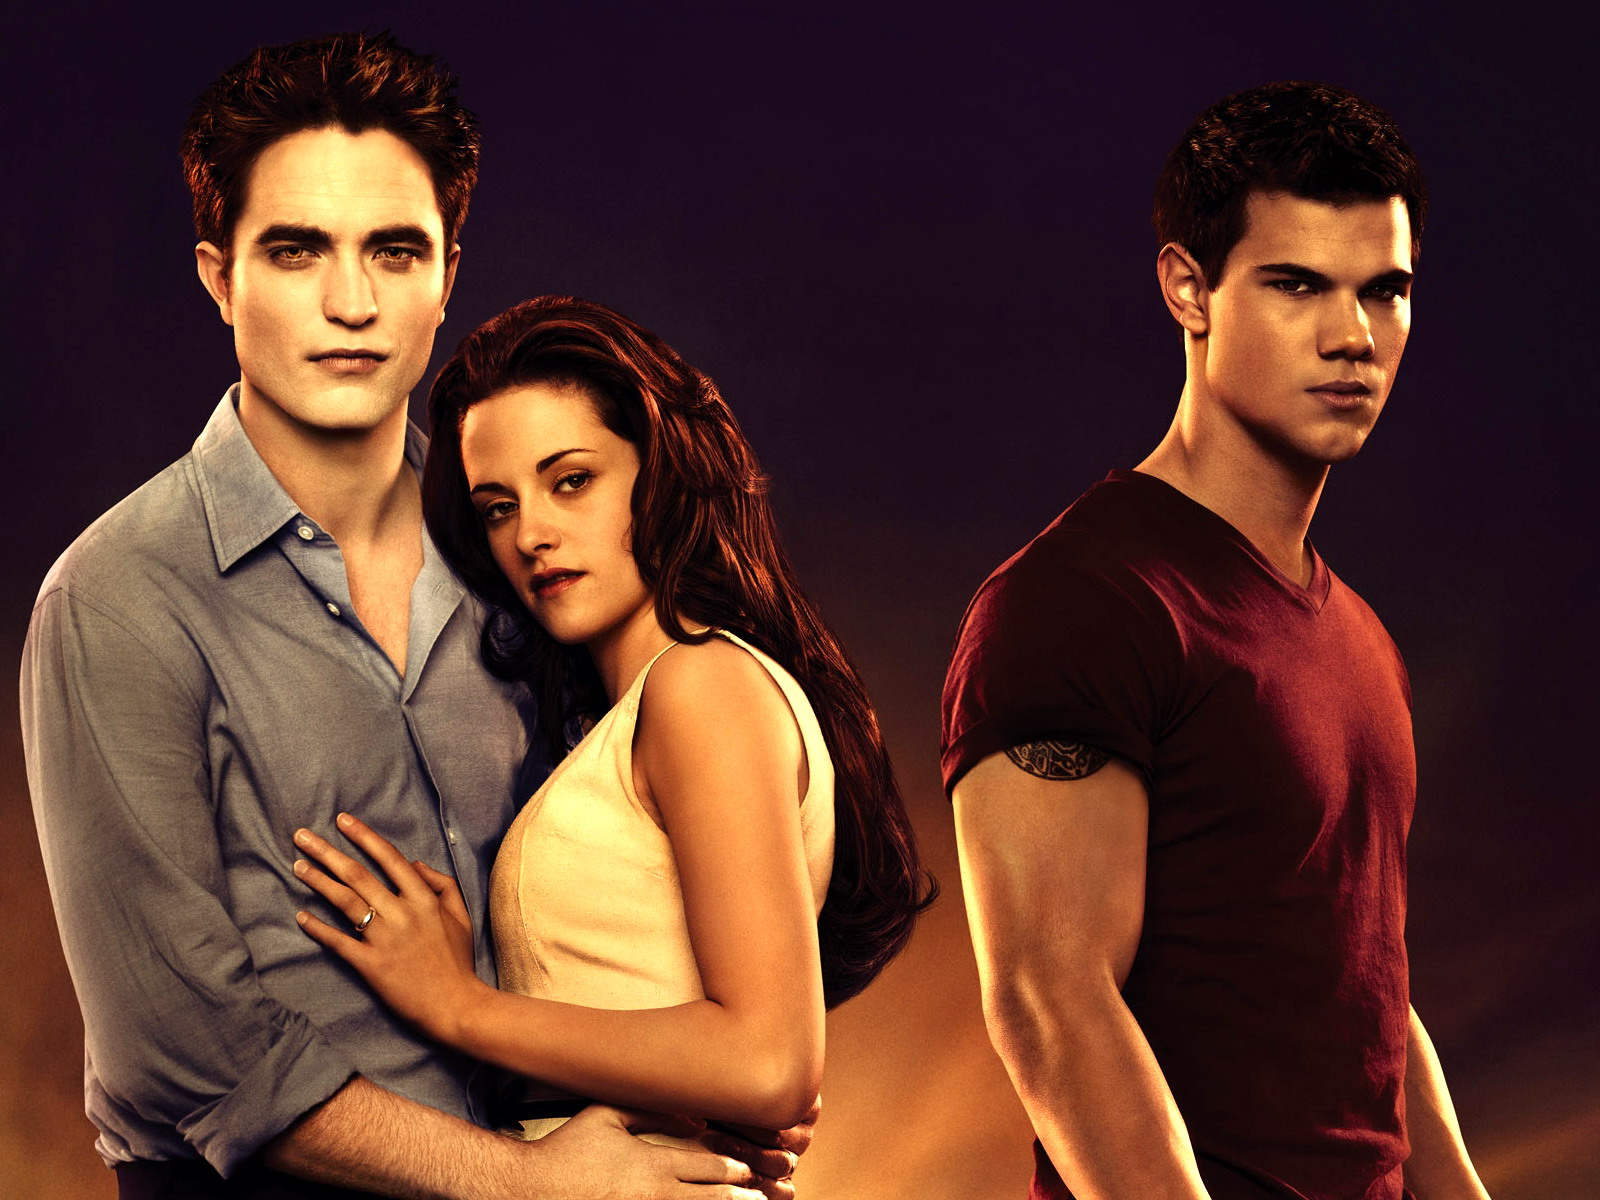 Photos The Twilight Saga Breaking Dawn The Twilight Saga Taylor Lautner Kristen Stewart Robert Pattinson film Movies